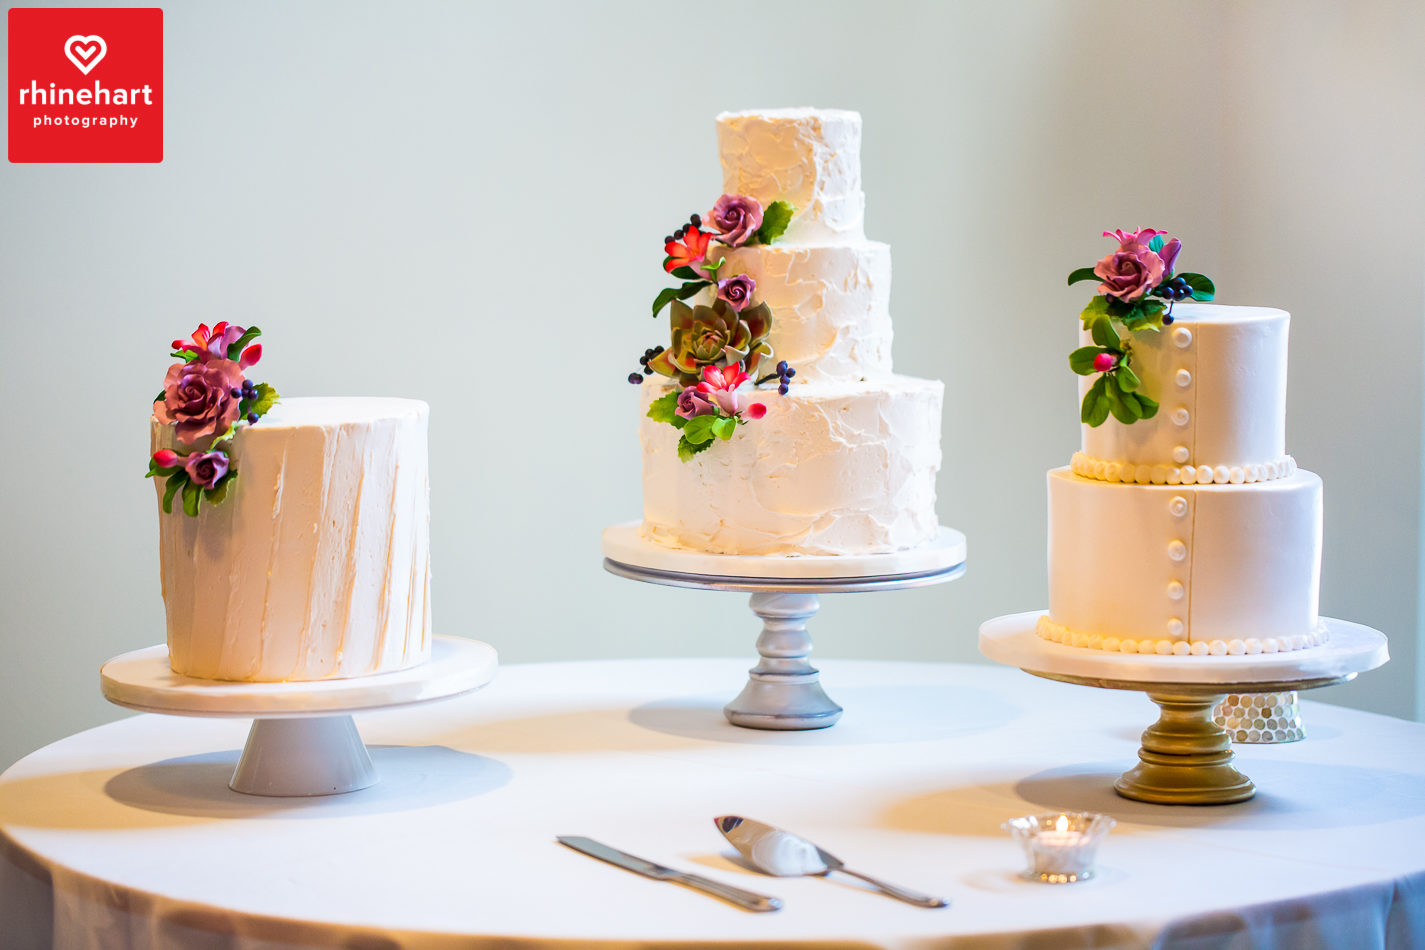 glasbern-inn-wedding-photographer-233